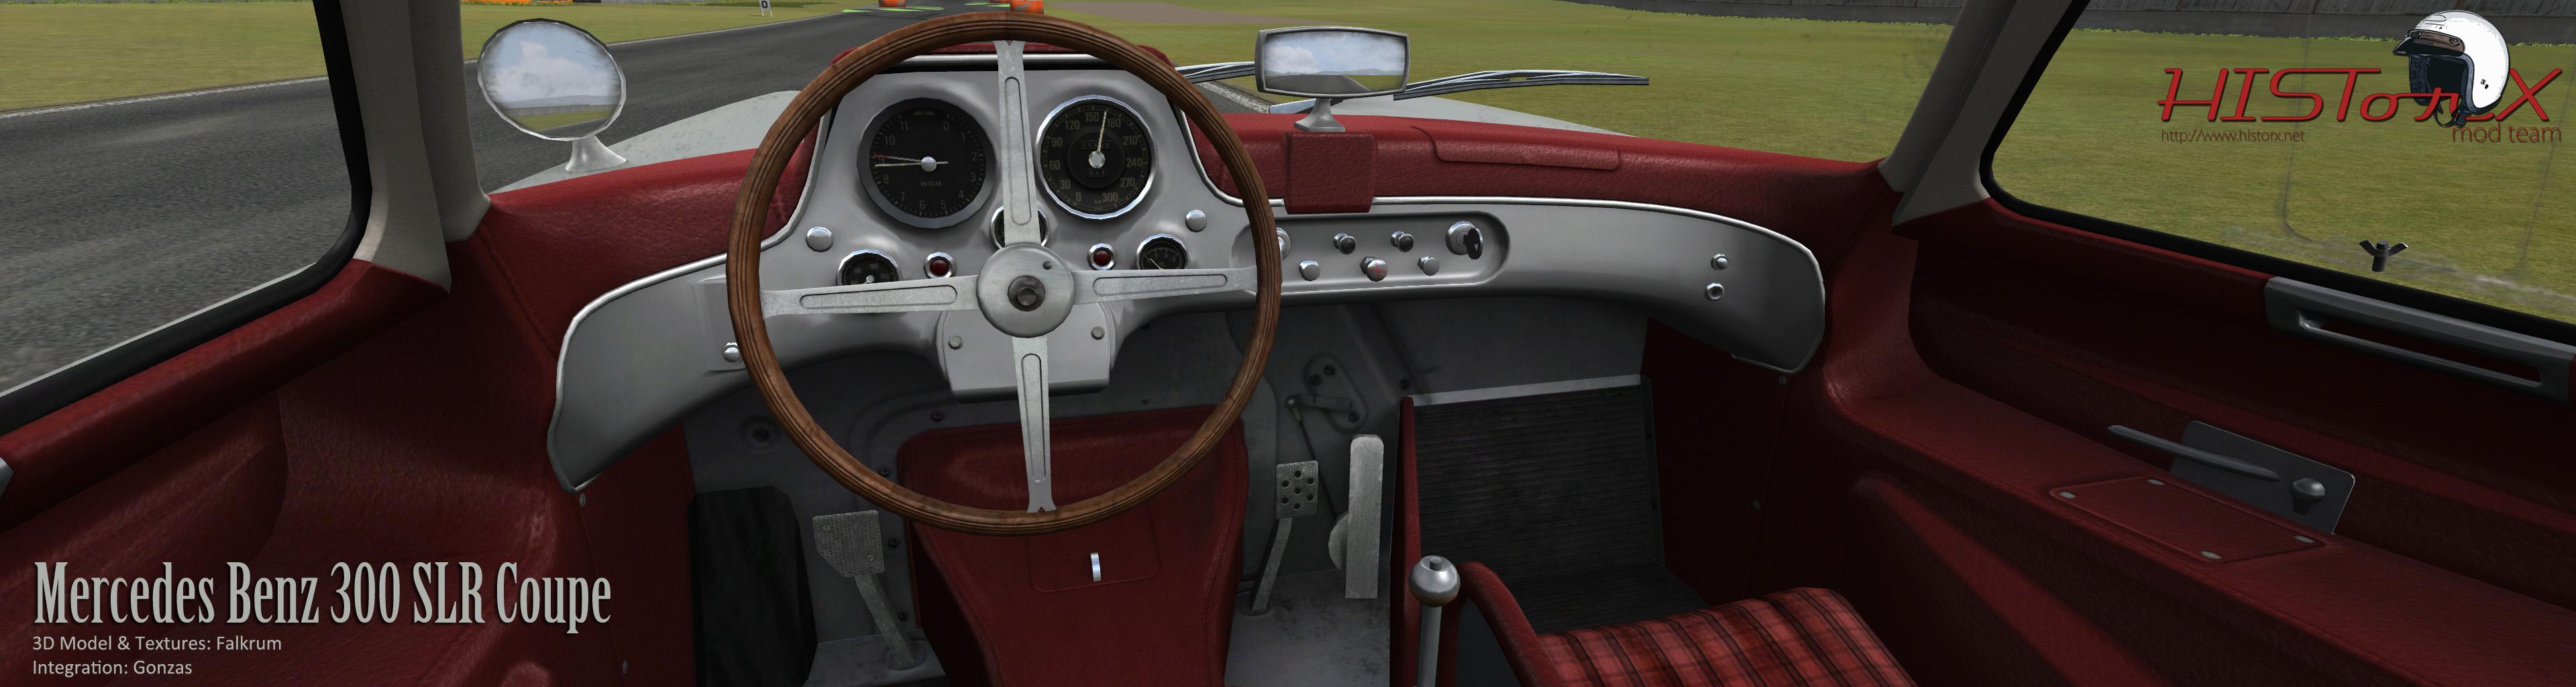 Historic GT & Touring Car 2 0 – 300SLR Cockpit Previews